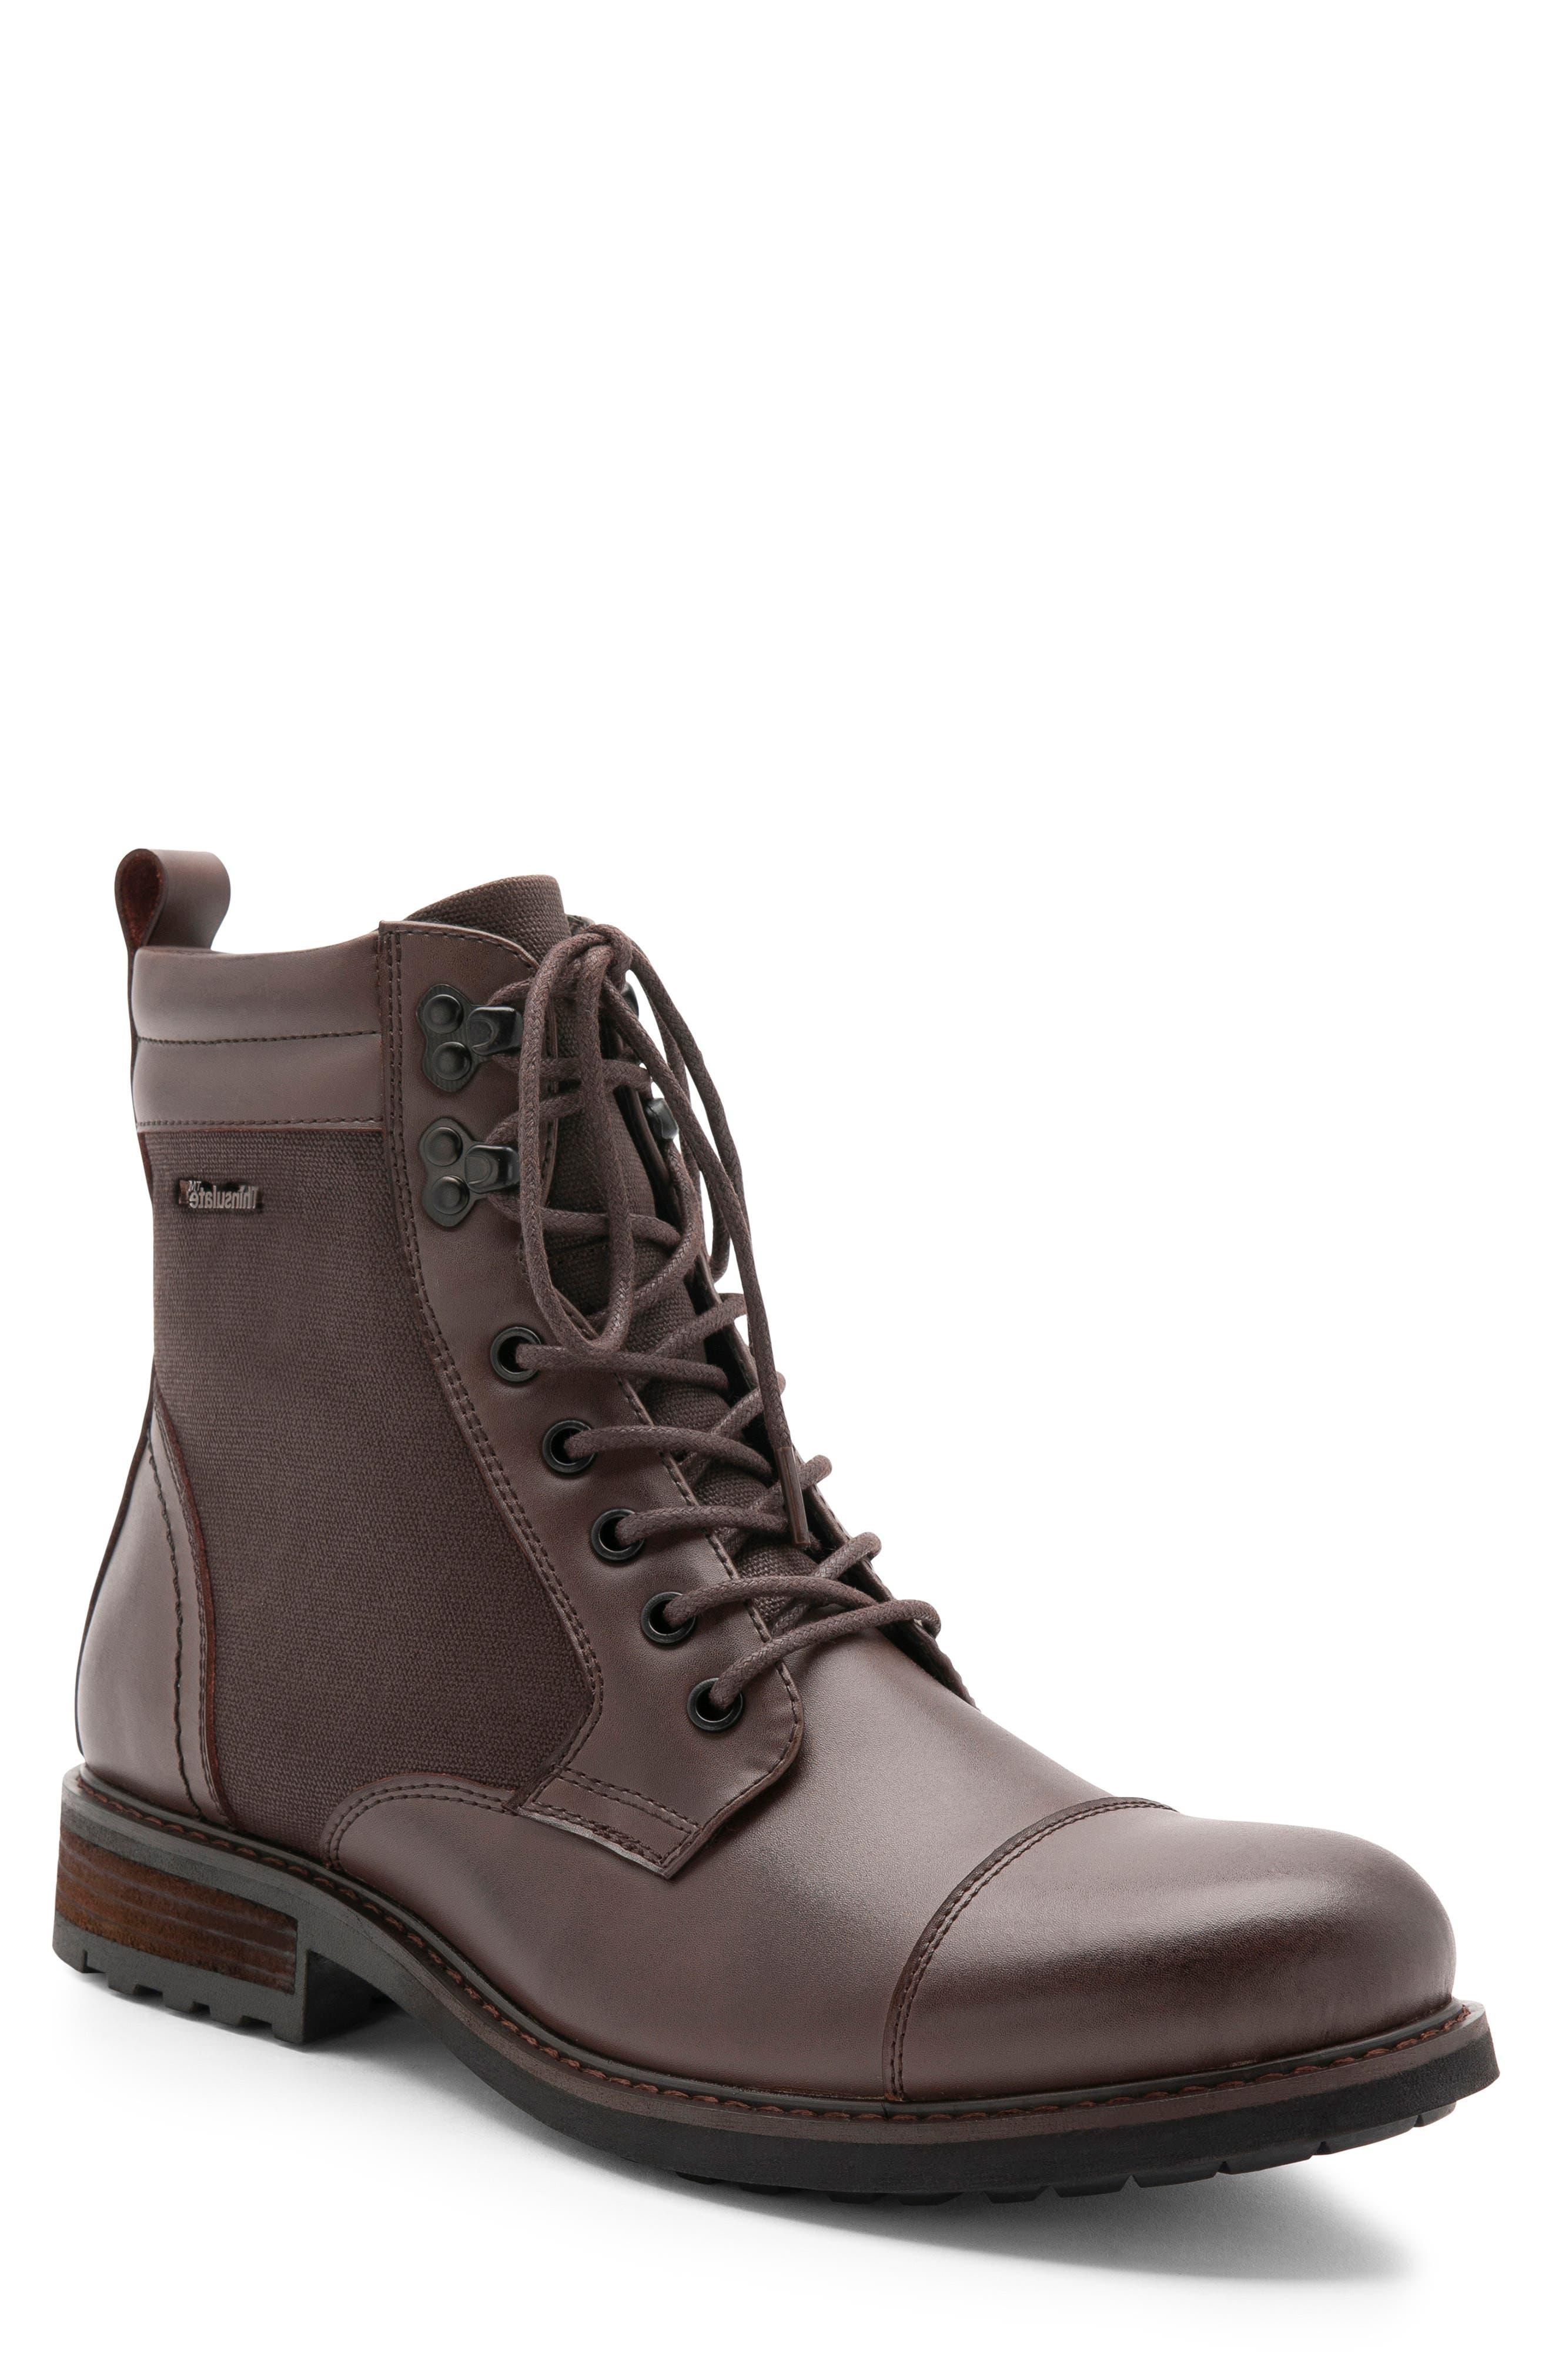 Blondo Paxton Waterproof Cap Toe Boot- Brown